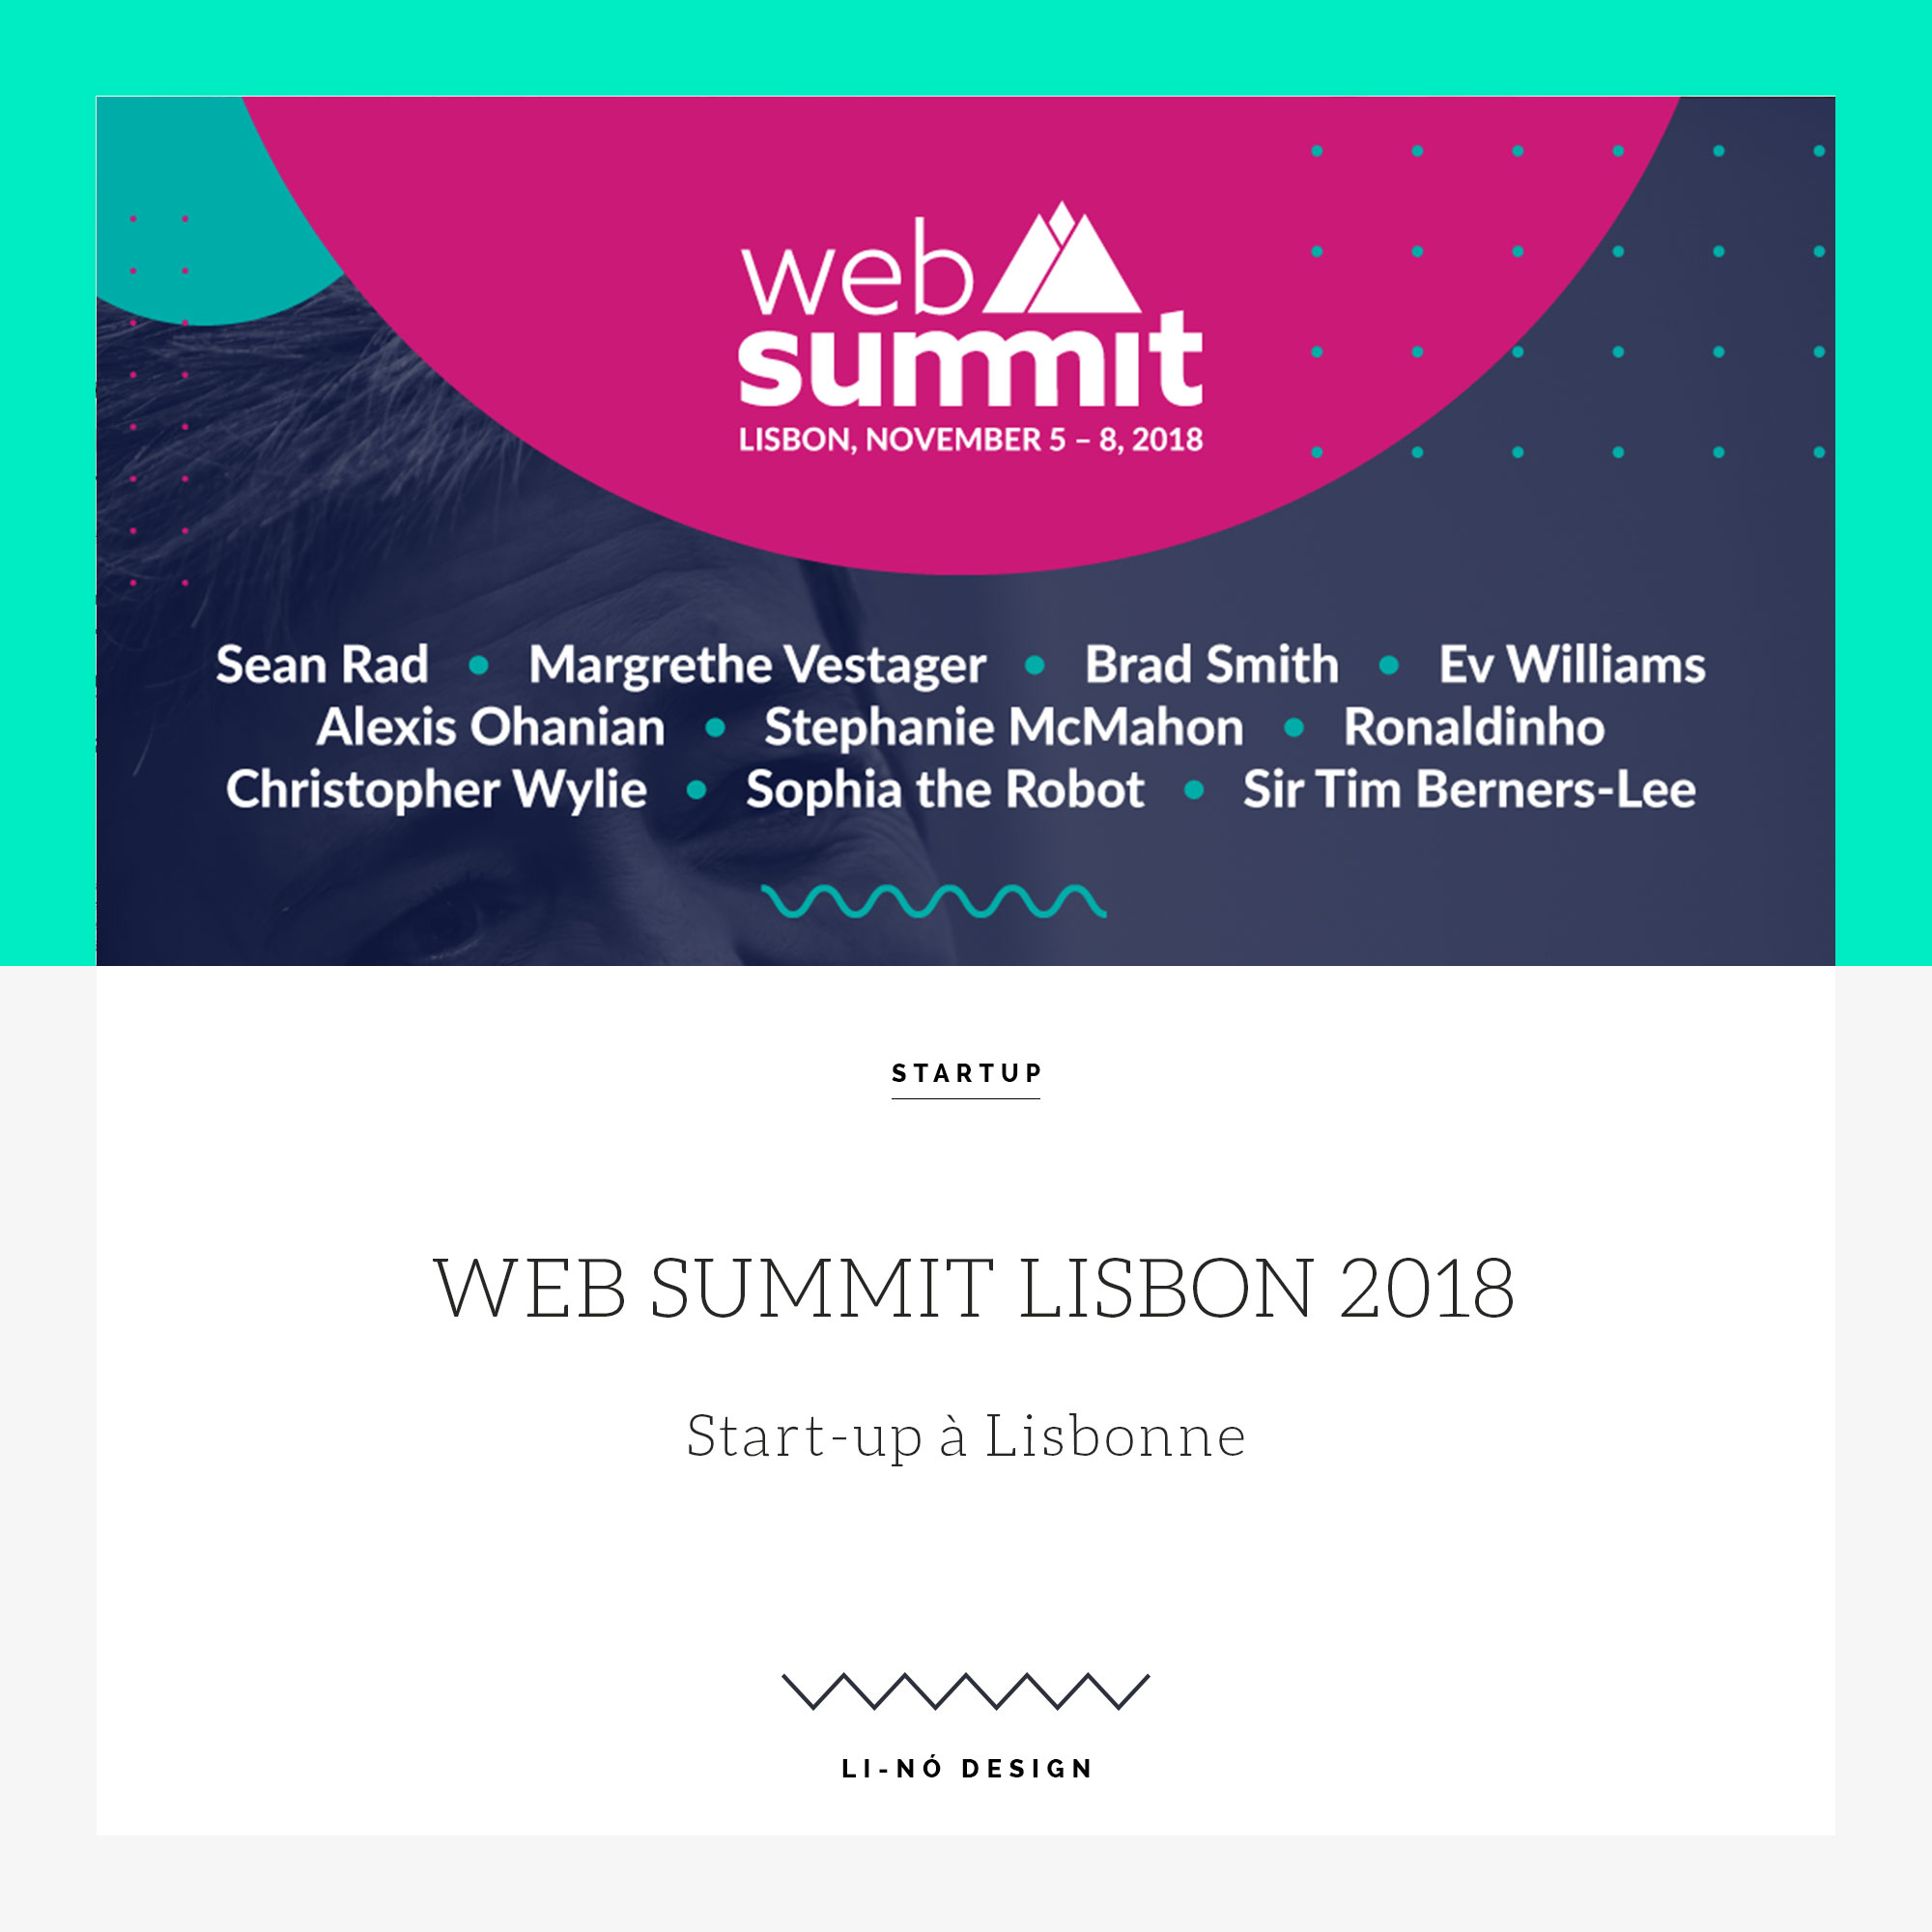 web summit lisbonne 2018